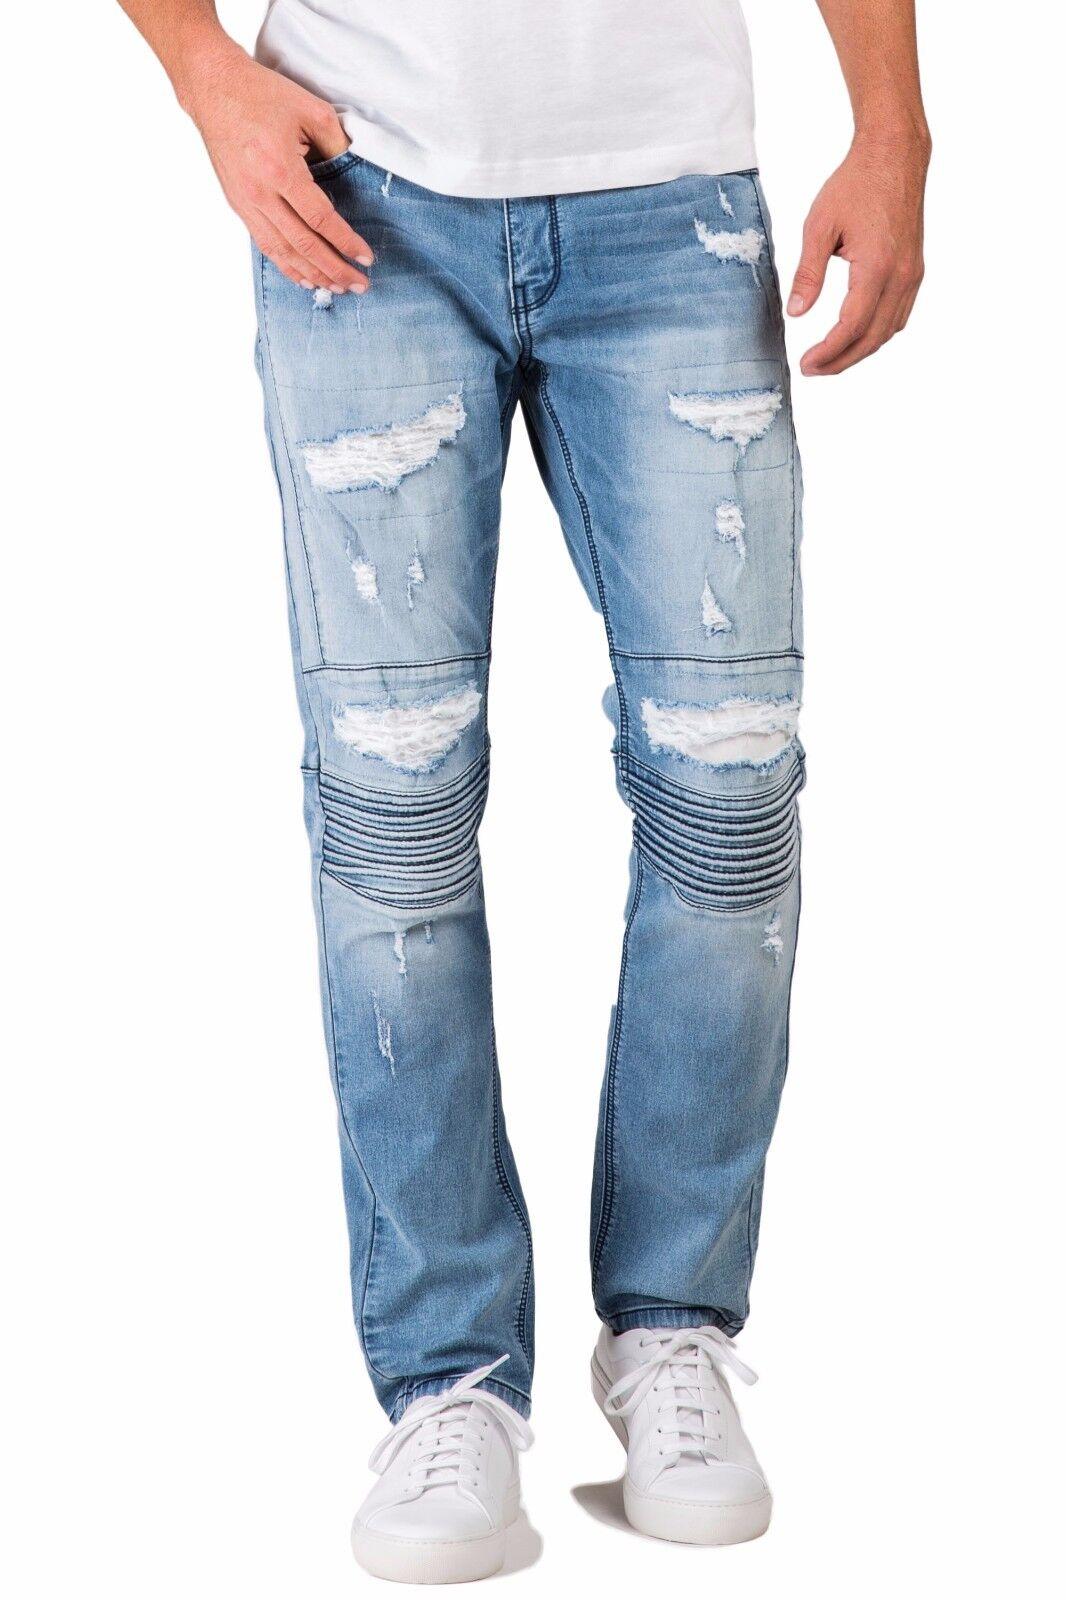 Level 7 Mens Premium Stretch Denim Moto Jeans bluee Slim Tapered Destroyed